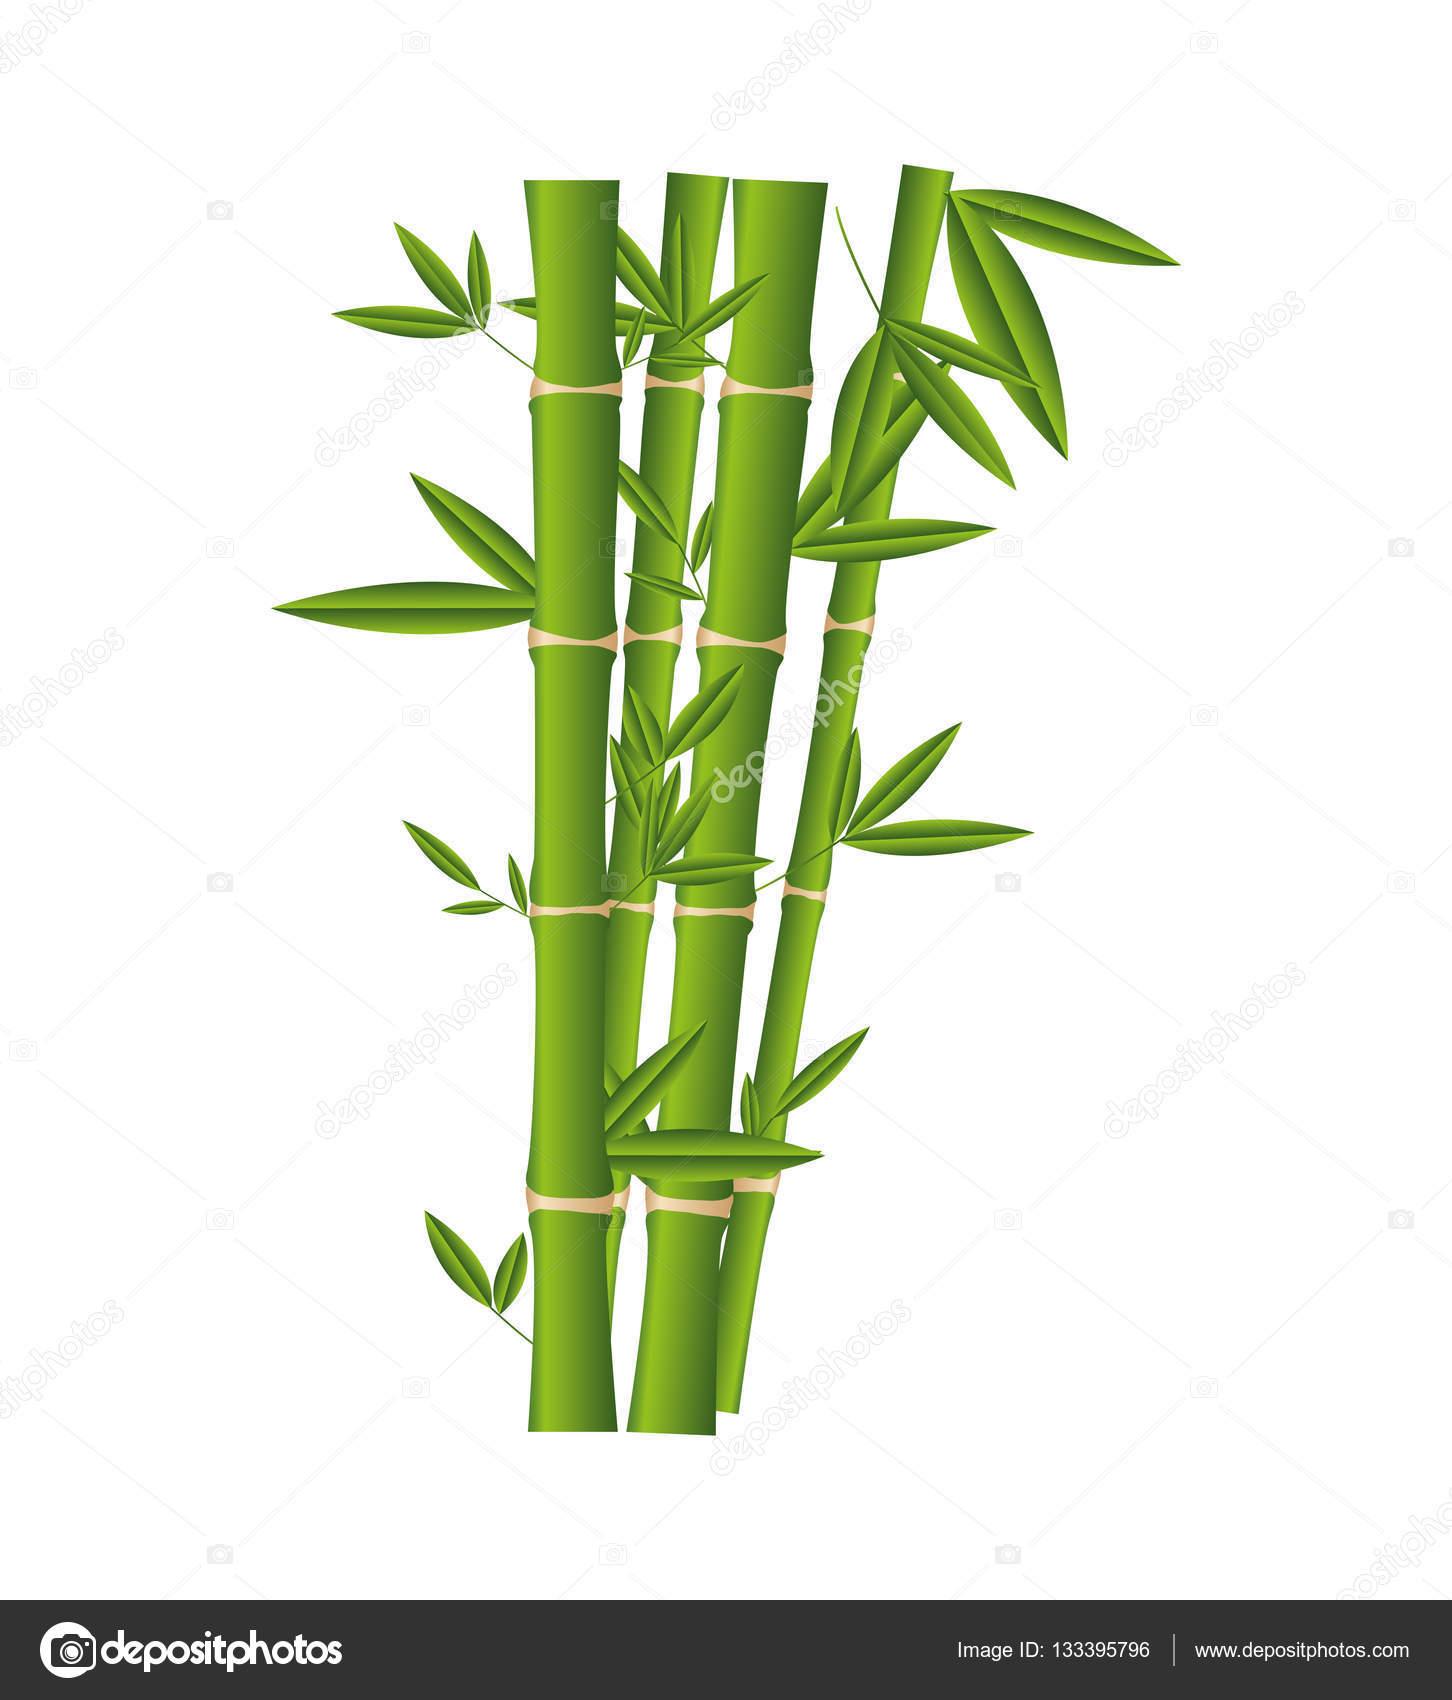 Bamboe plant ge soleerde pictogram stockvector for Bamboe plant